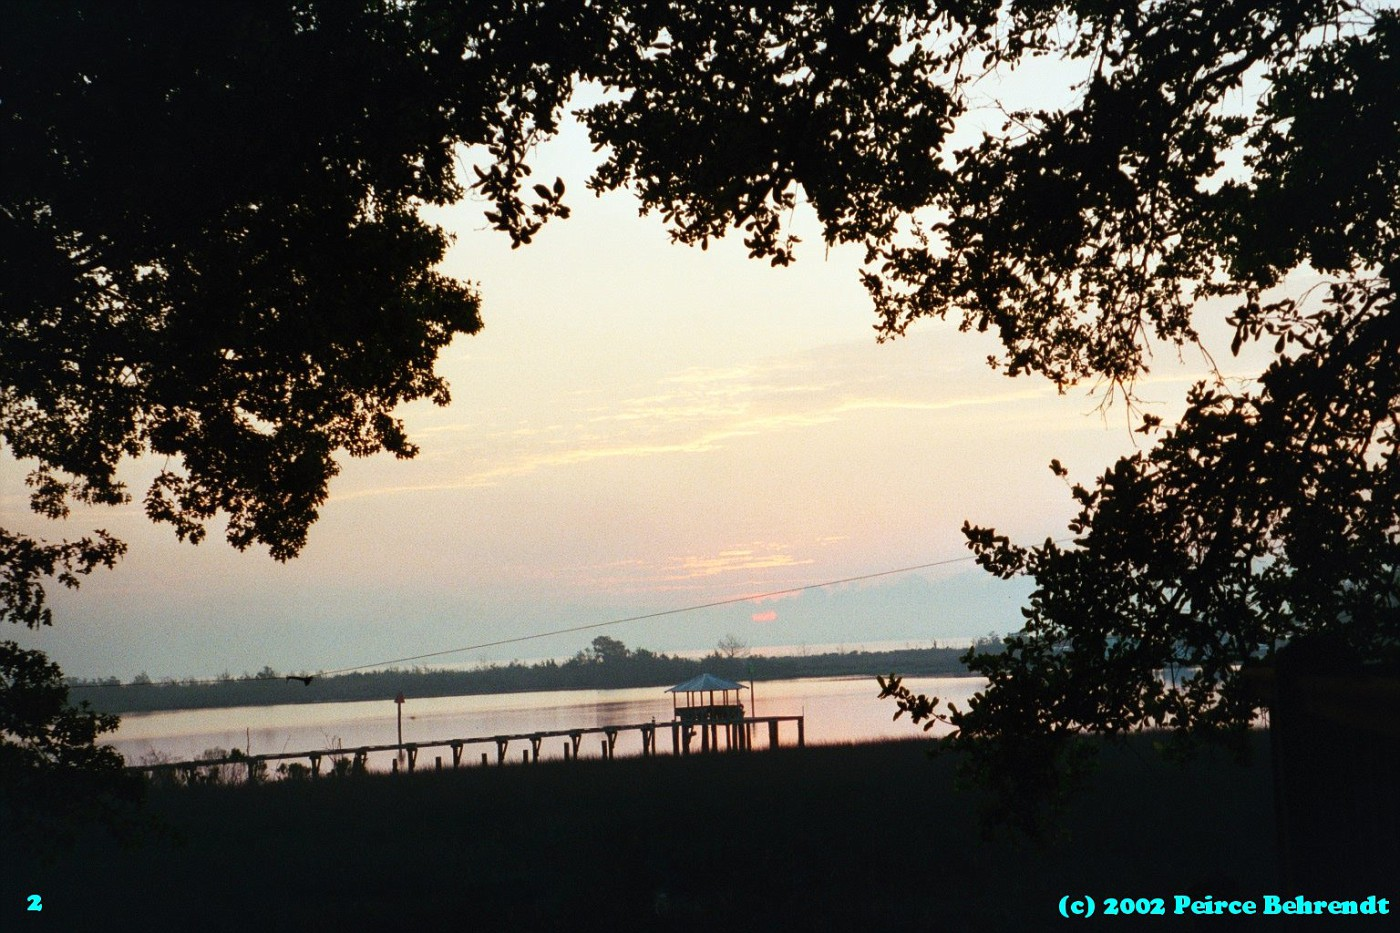 Sunrise on Mobile Bay, 2 of 4